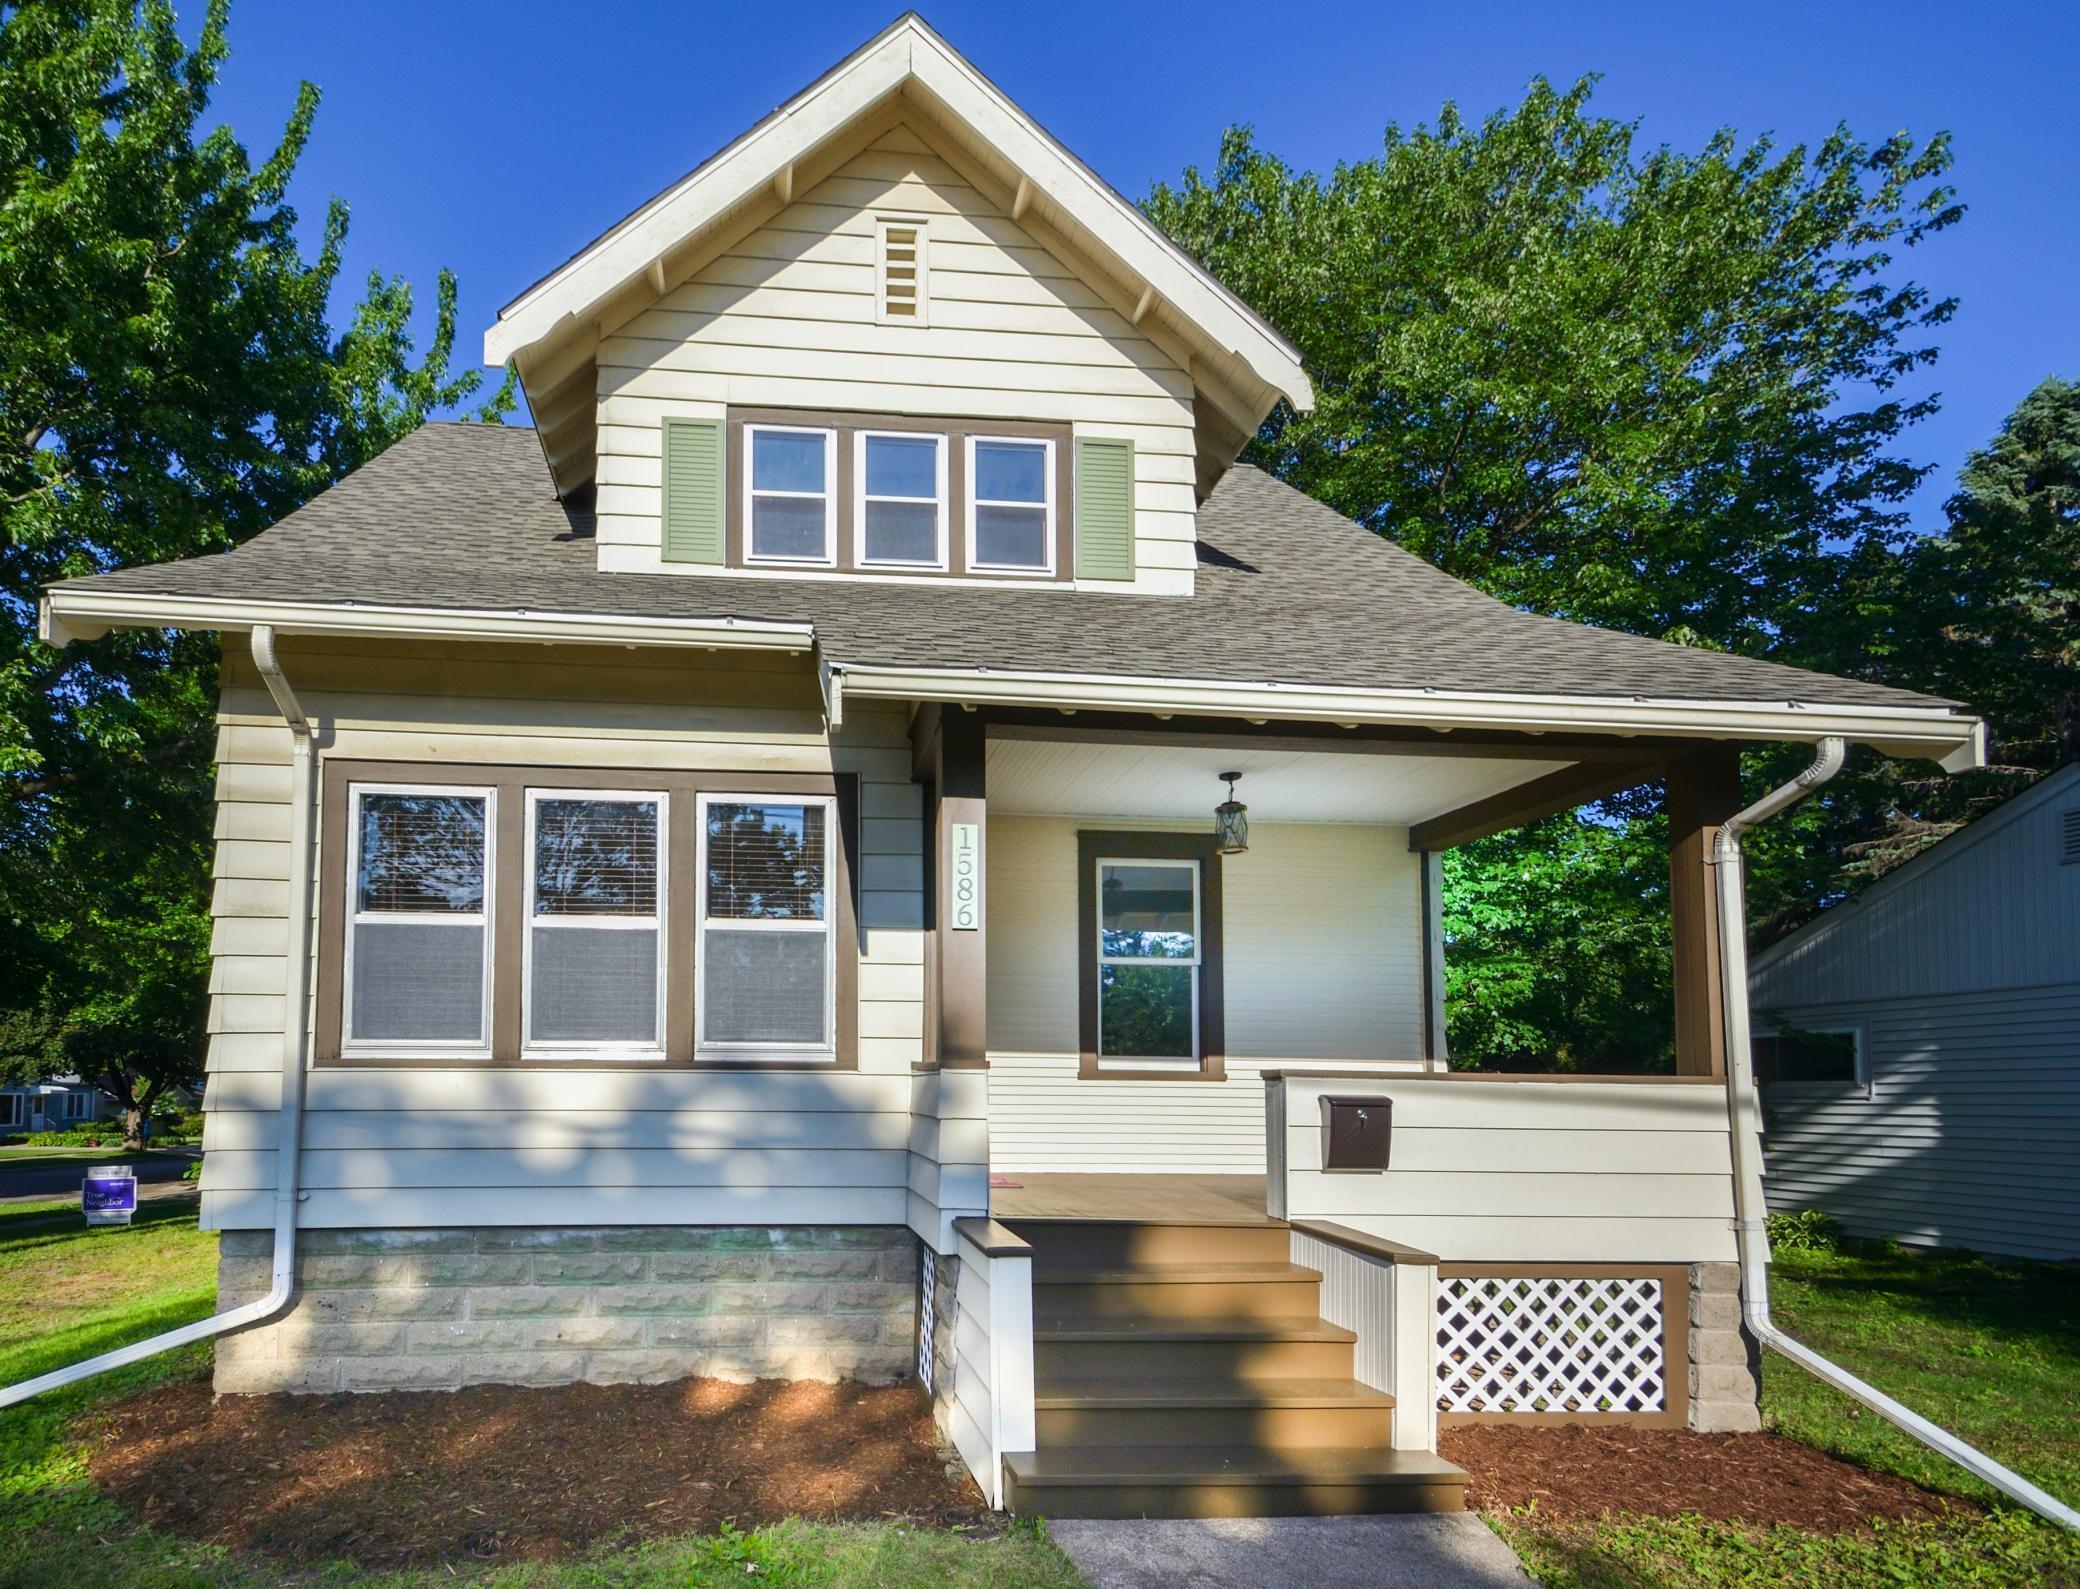 1586 Lexington N Property Photo - Saint Paul, MN real estate listing